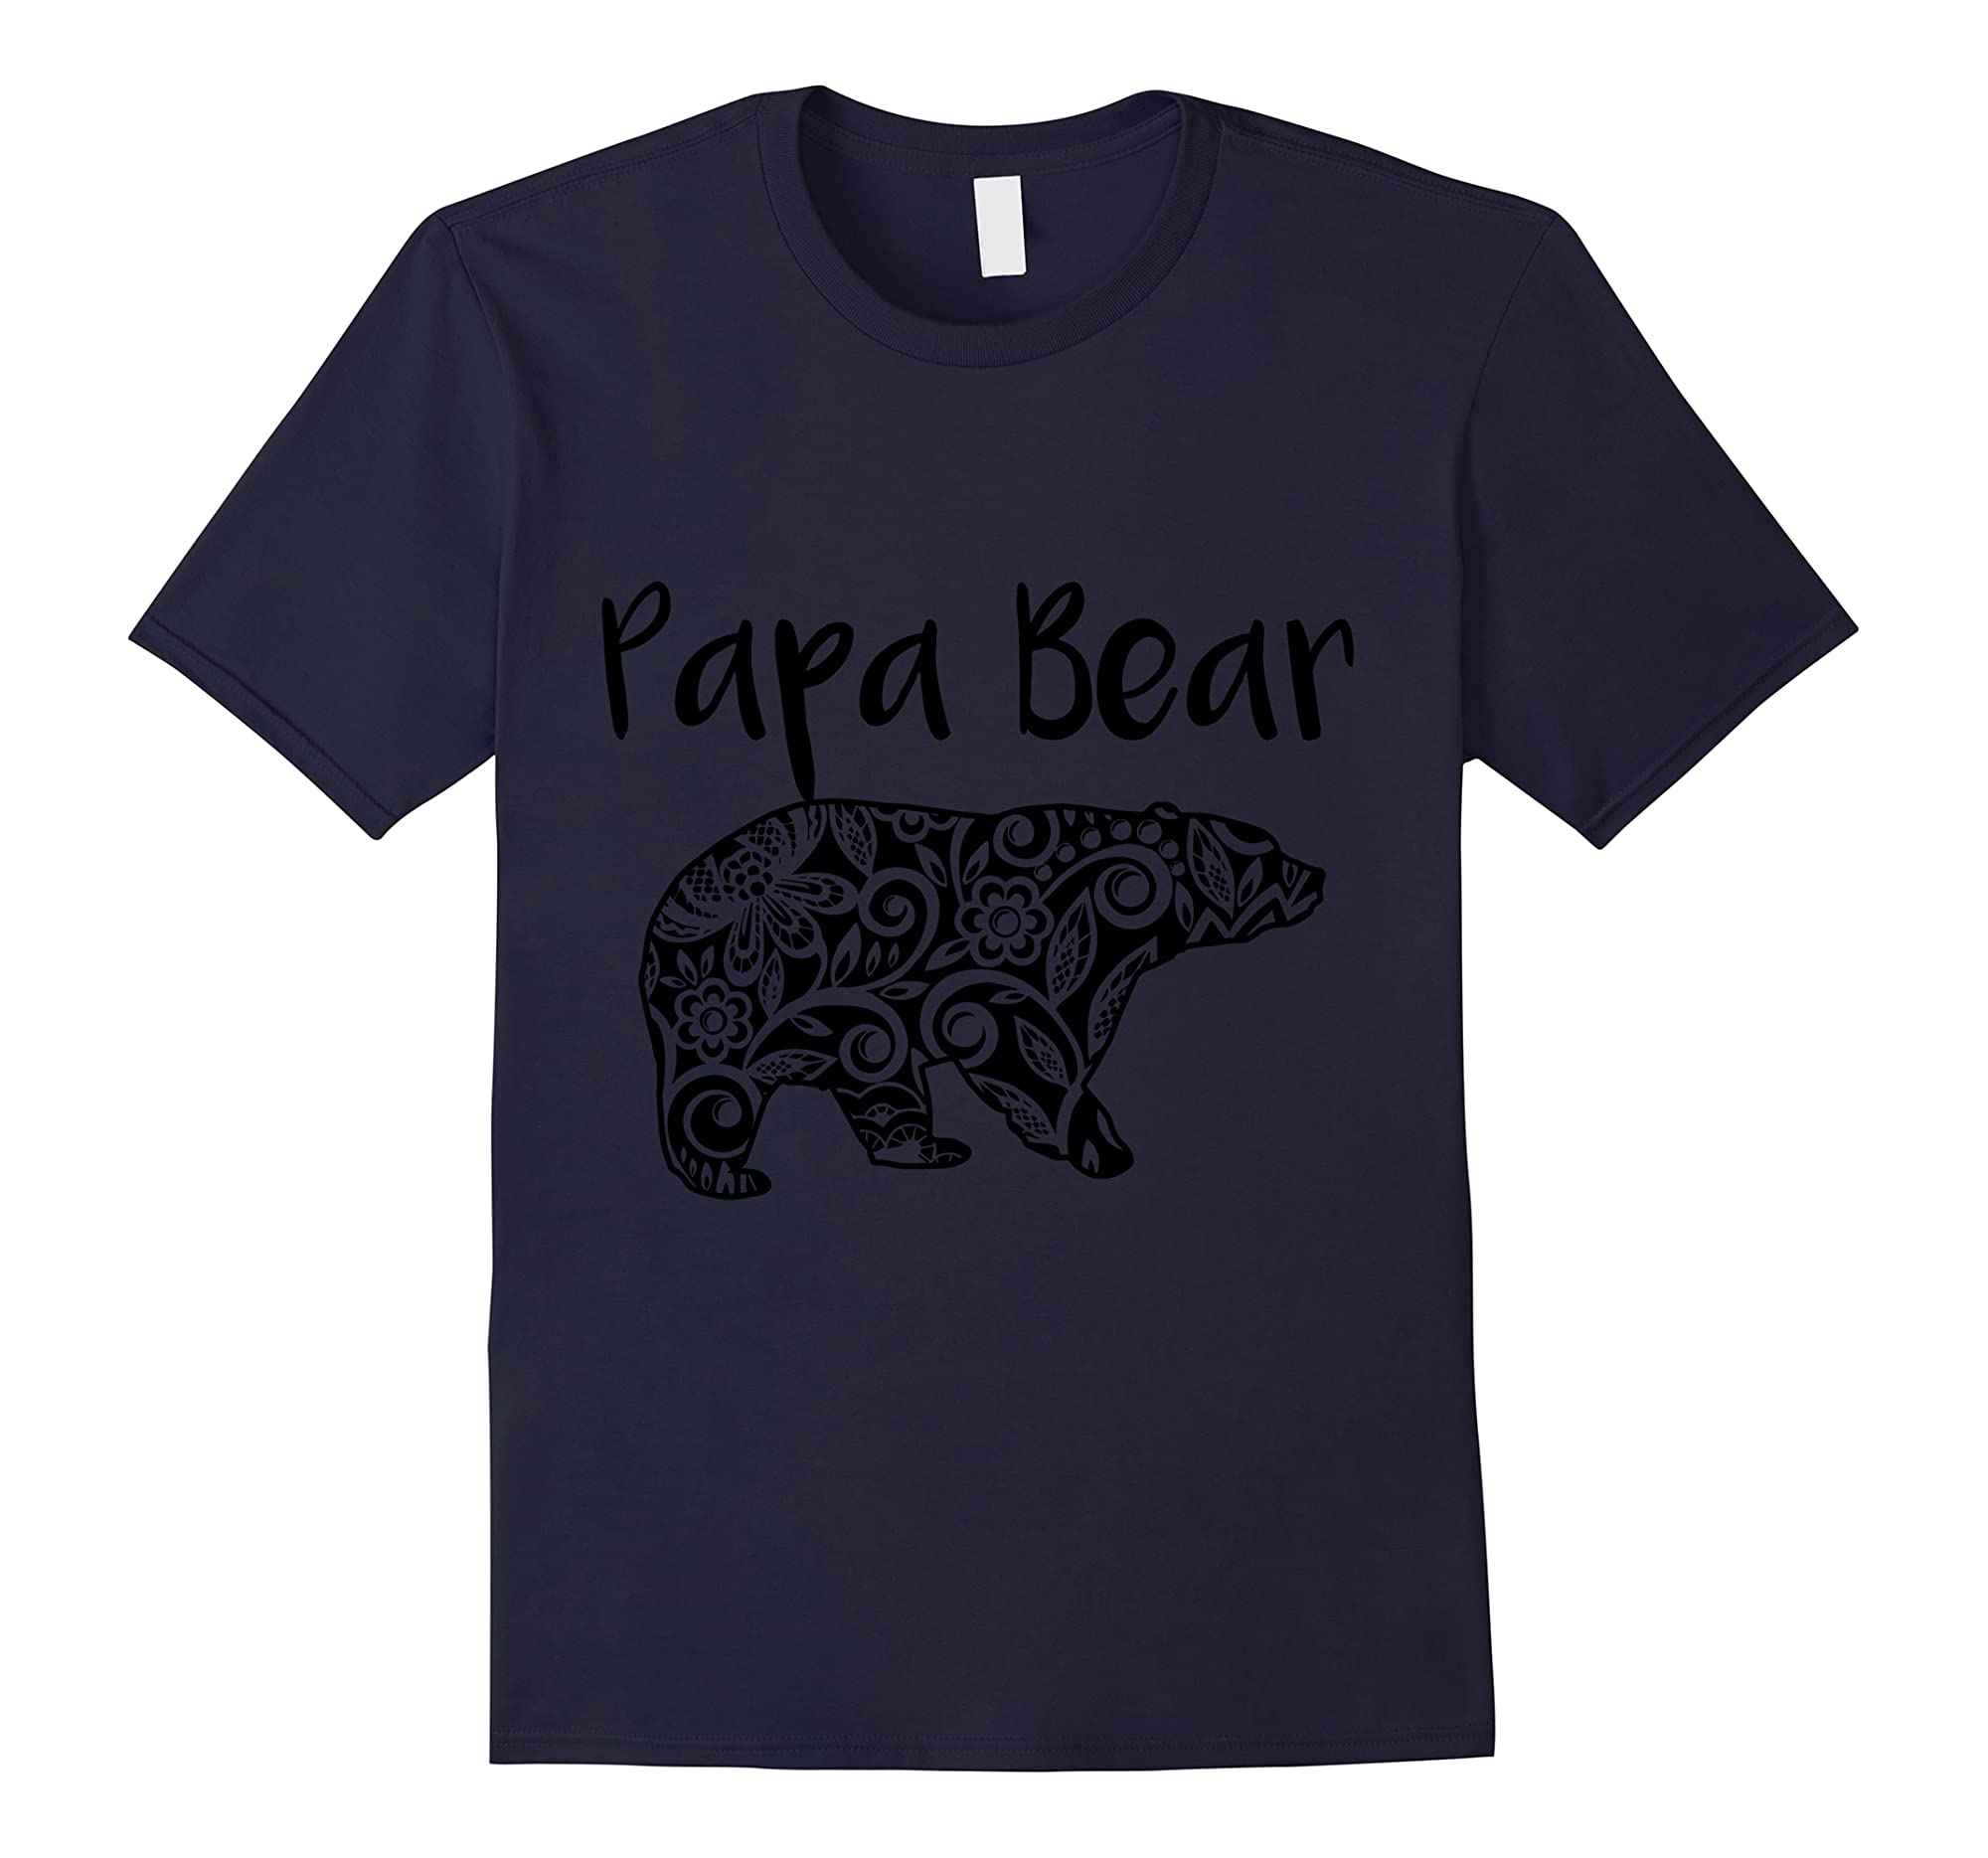 Fortuitous Dta Dta S Mama Papa Baby Bear Funny Family Matching Mother Day Ts Shirts Navy